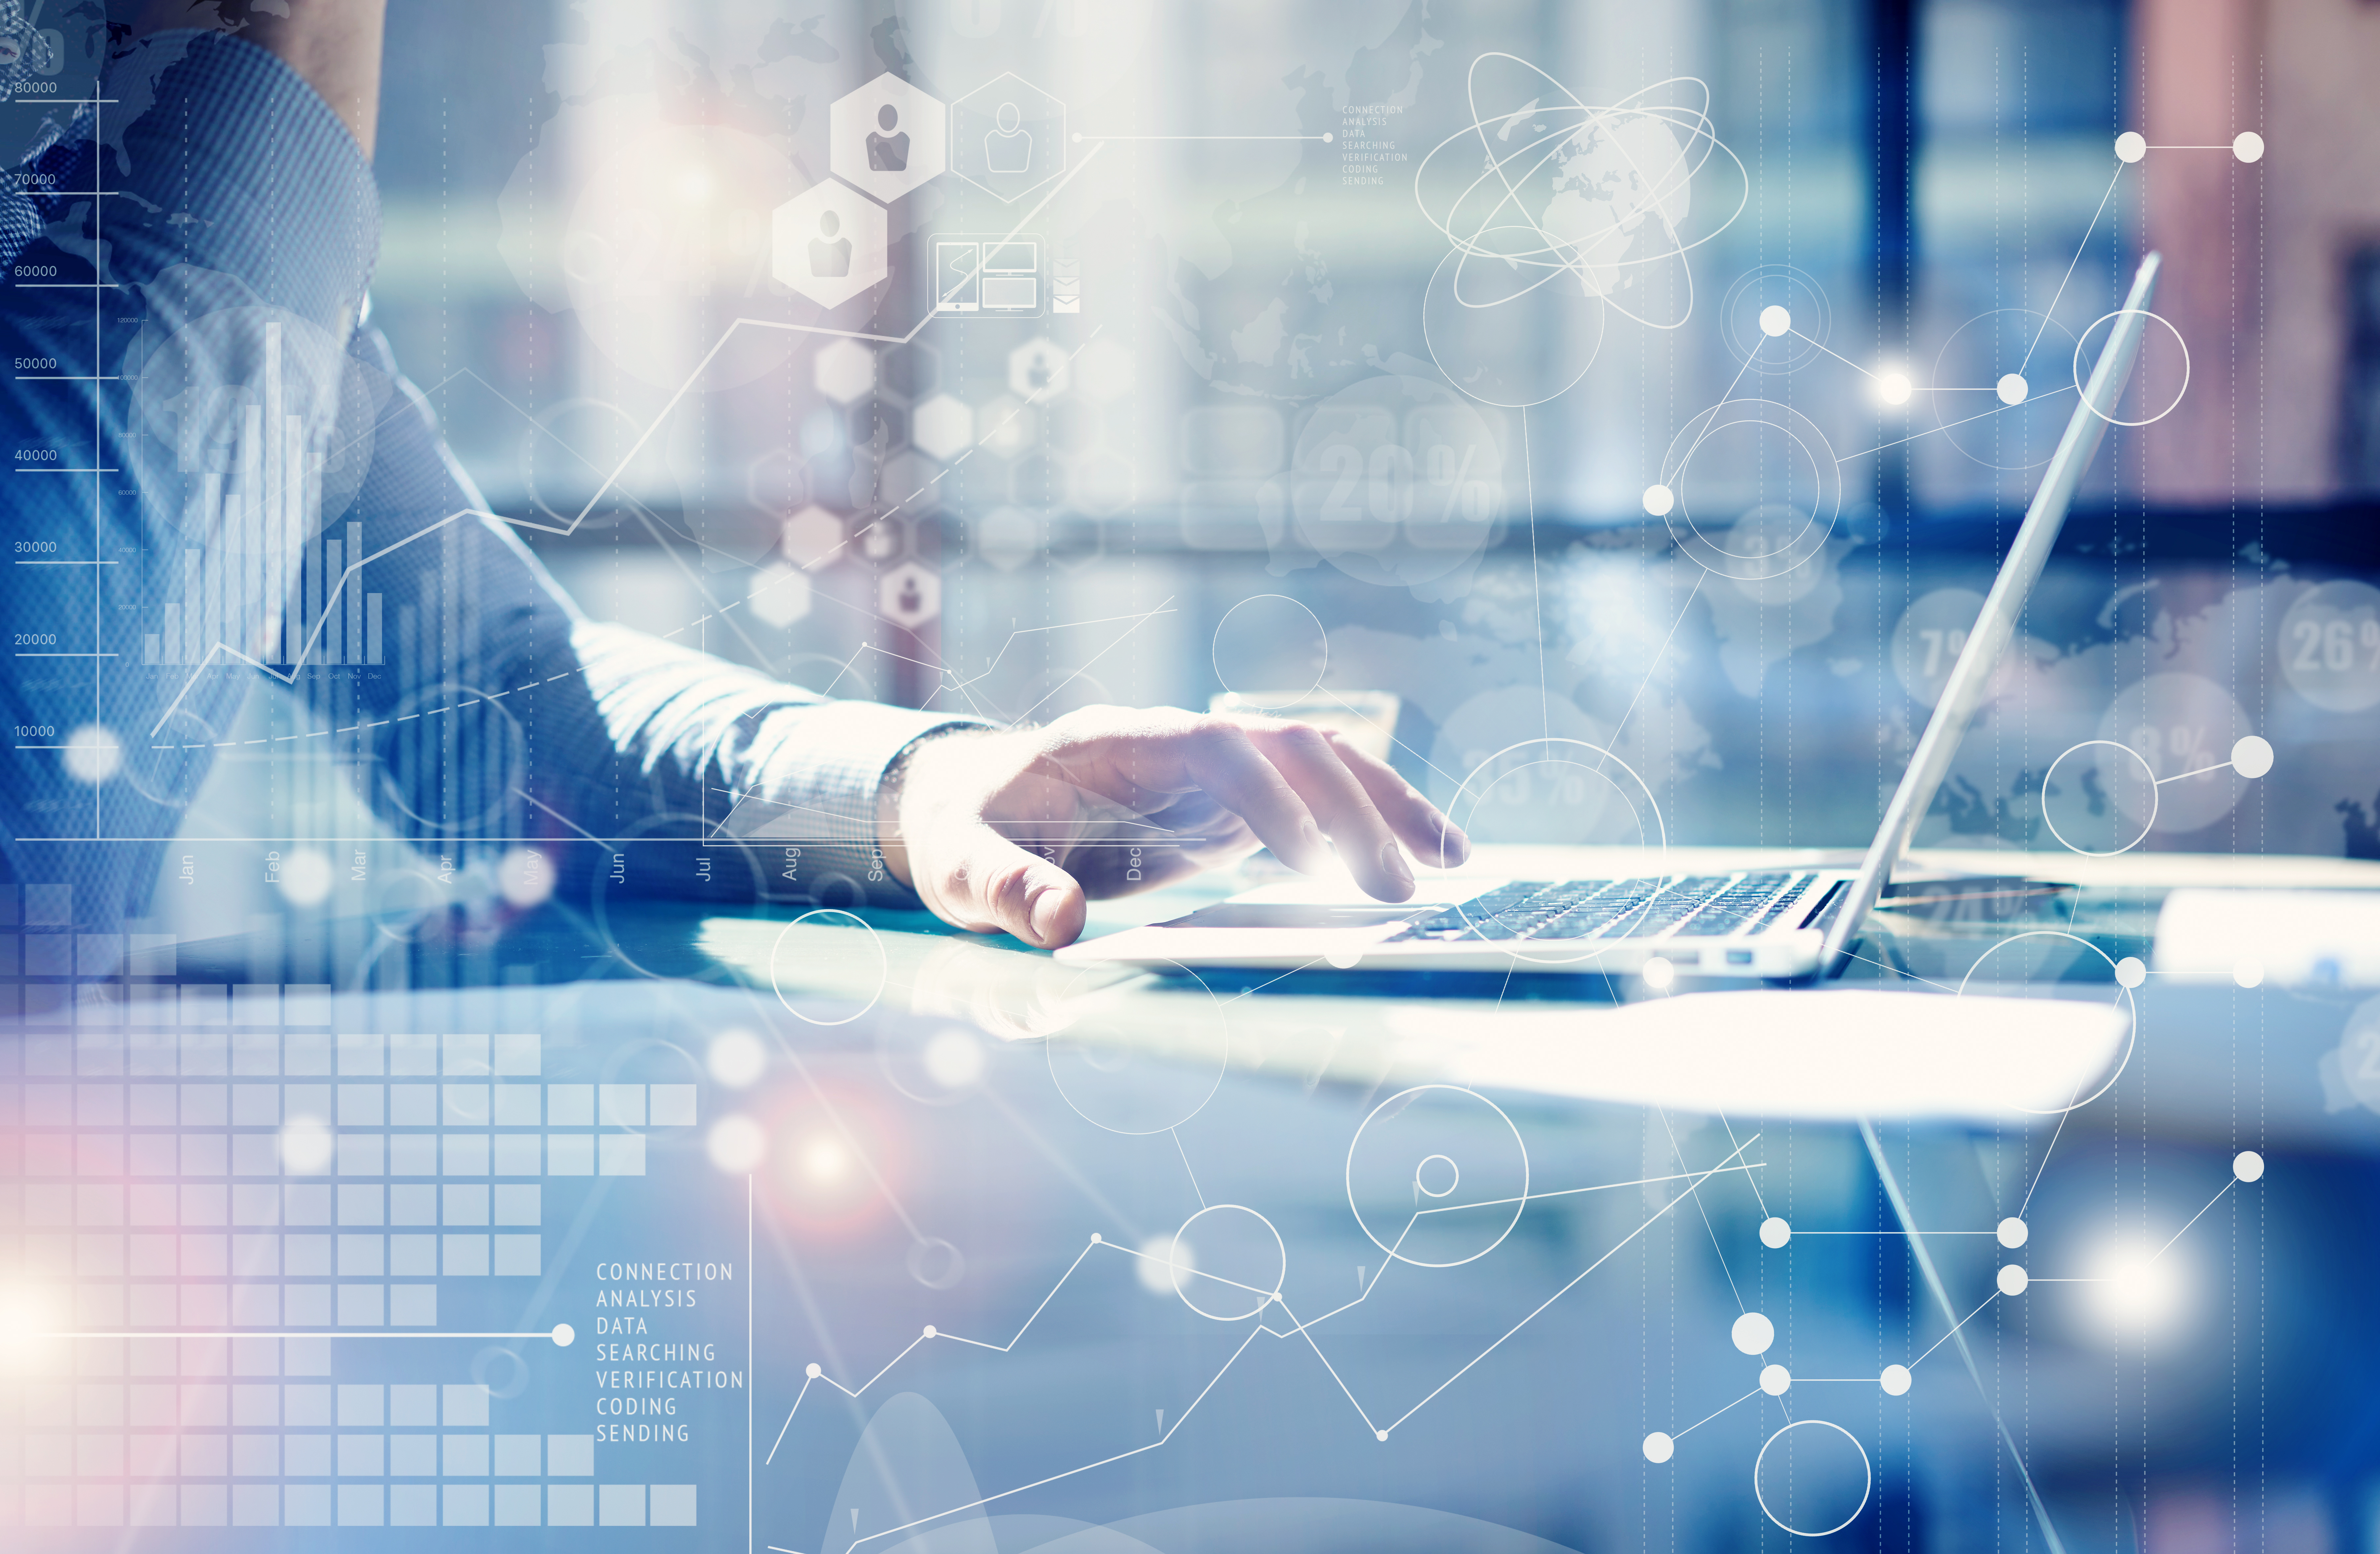 Latize_Beyond_Standard_Business_Intelligence_Tools_1